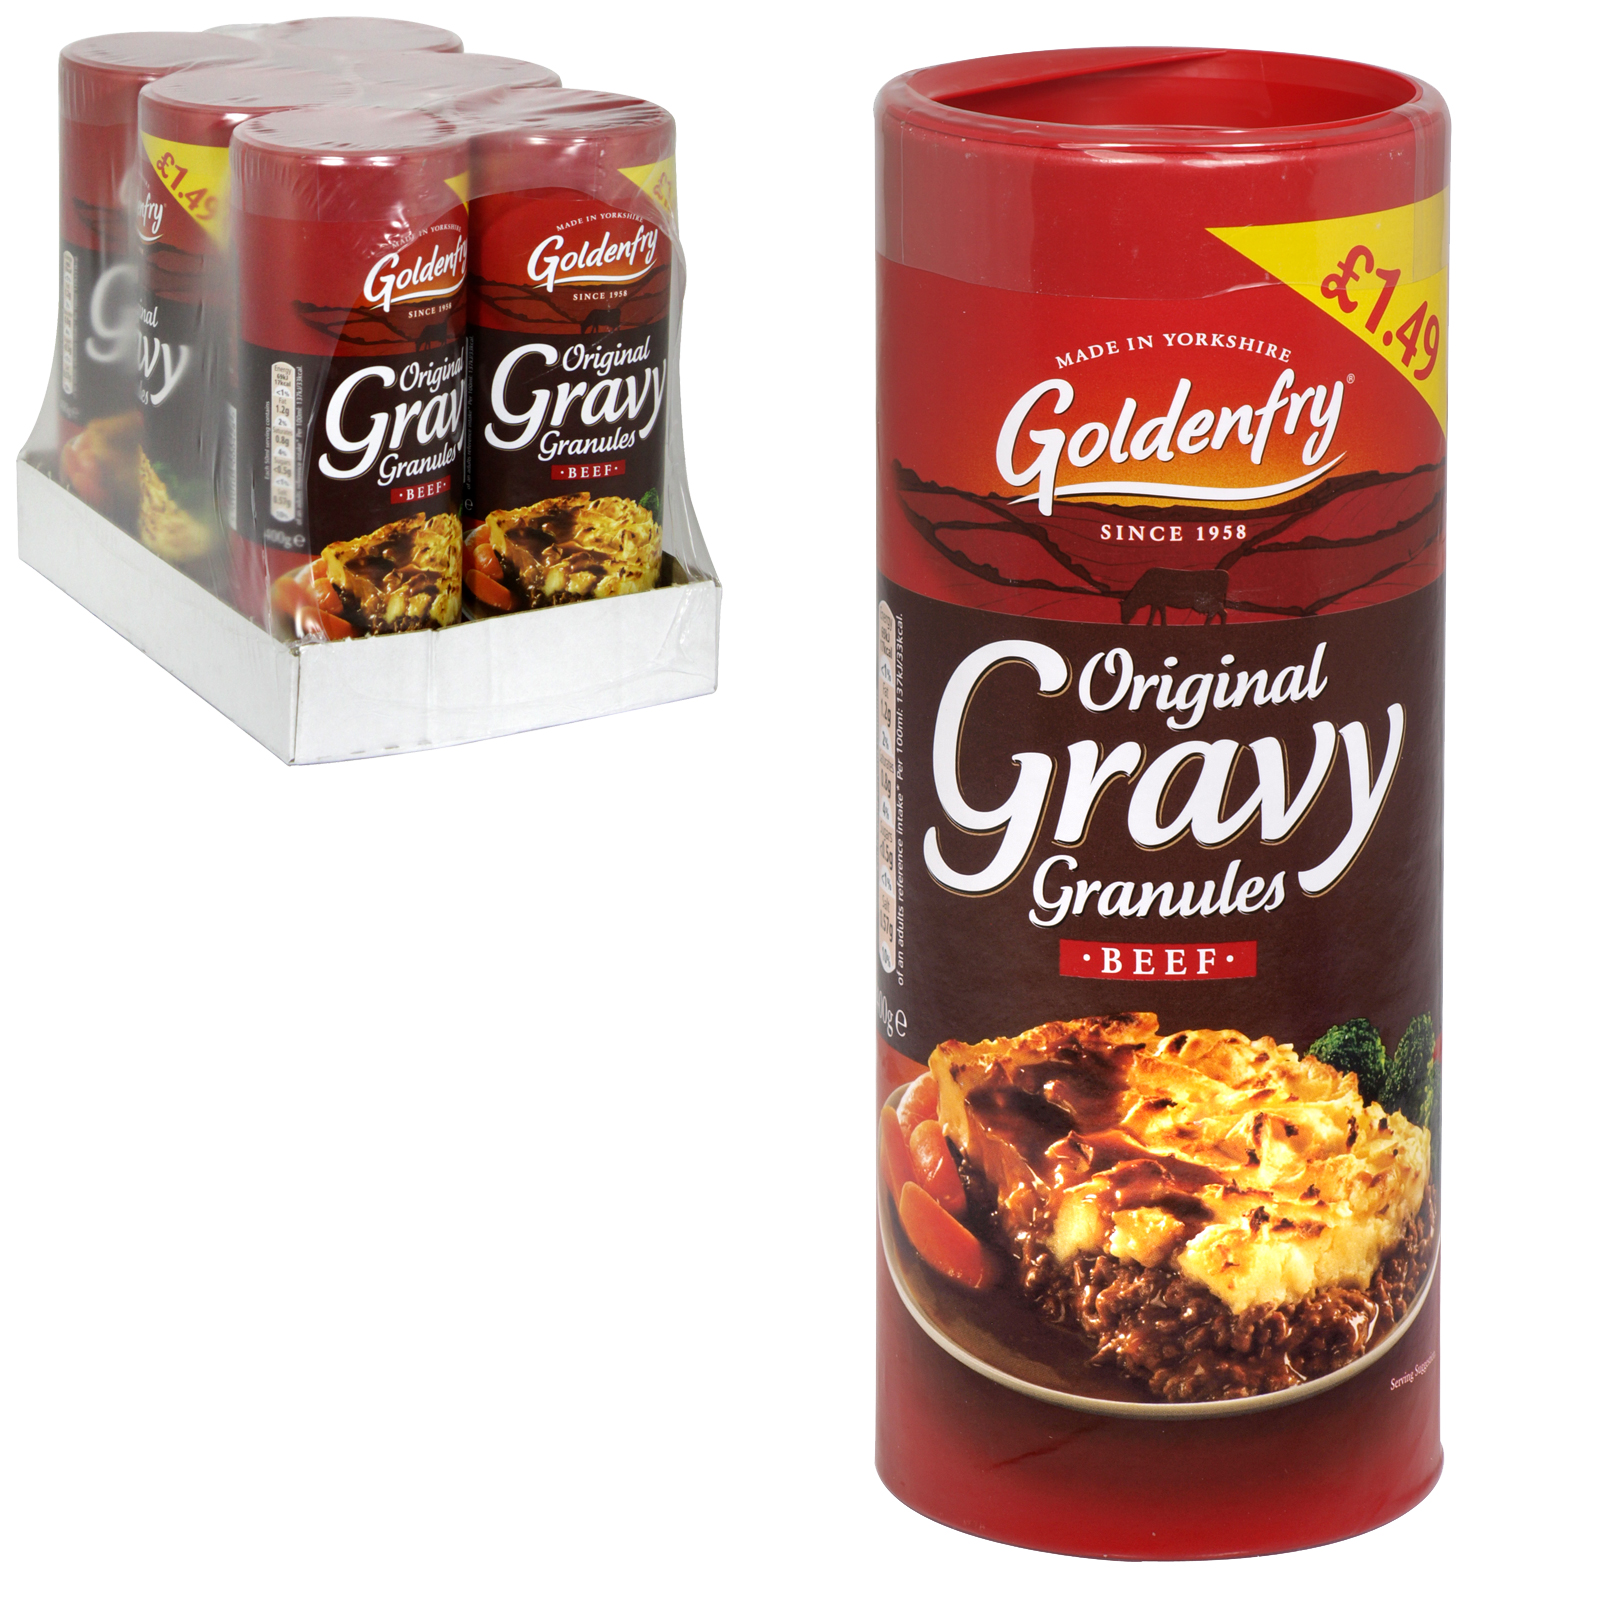 GOLDEN FRY BEEF GRAVY GRANULES 400G PM ?1.49 X6